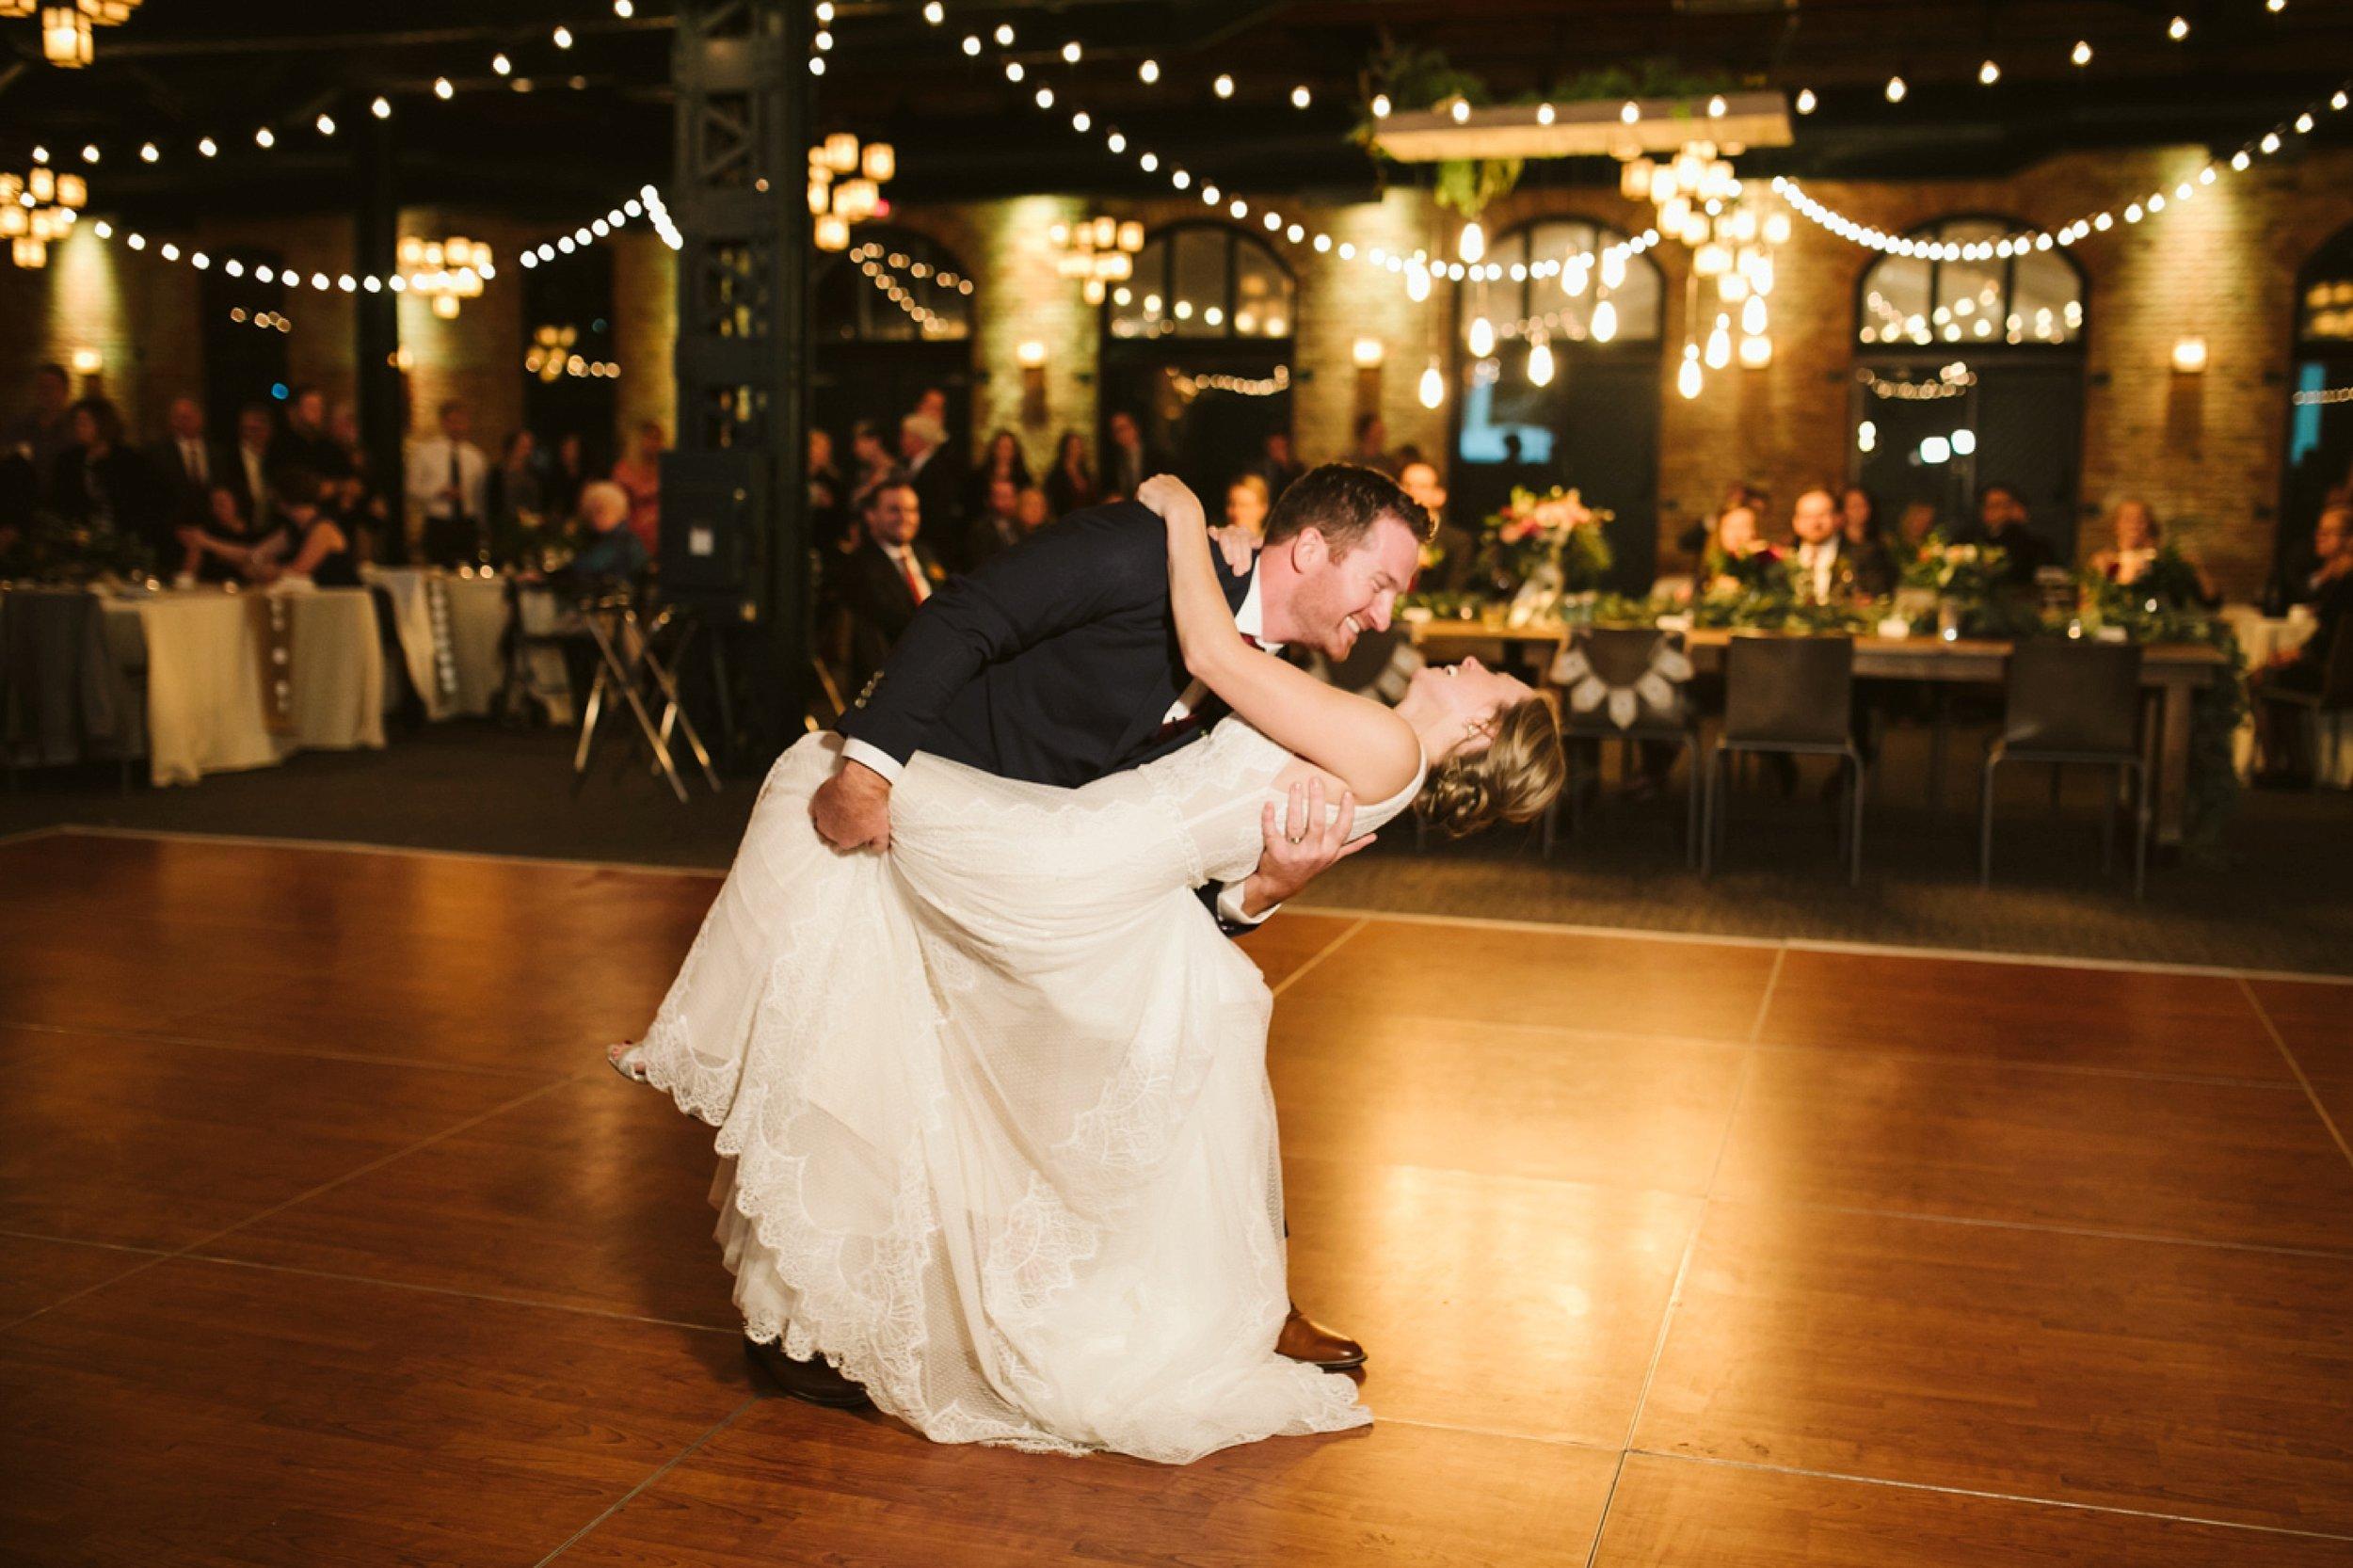 Nicollet-Island-Pavilion-Minneapolis-September-Coral-Navy-Wedding-169.jpg